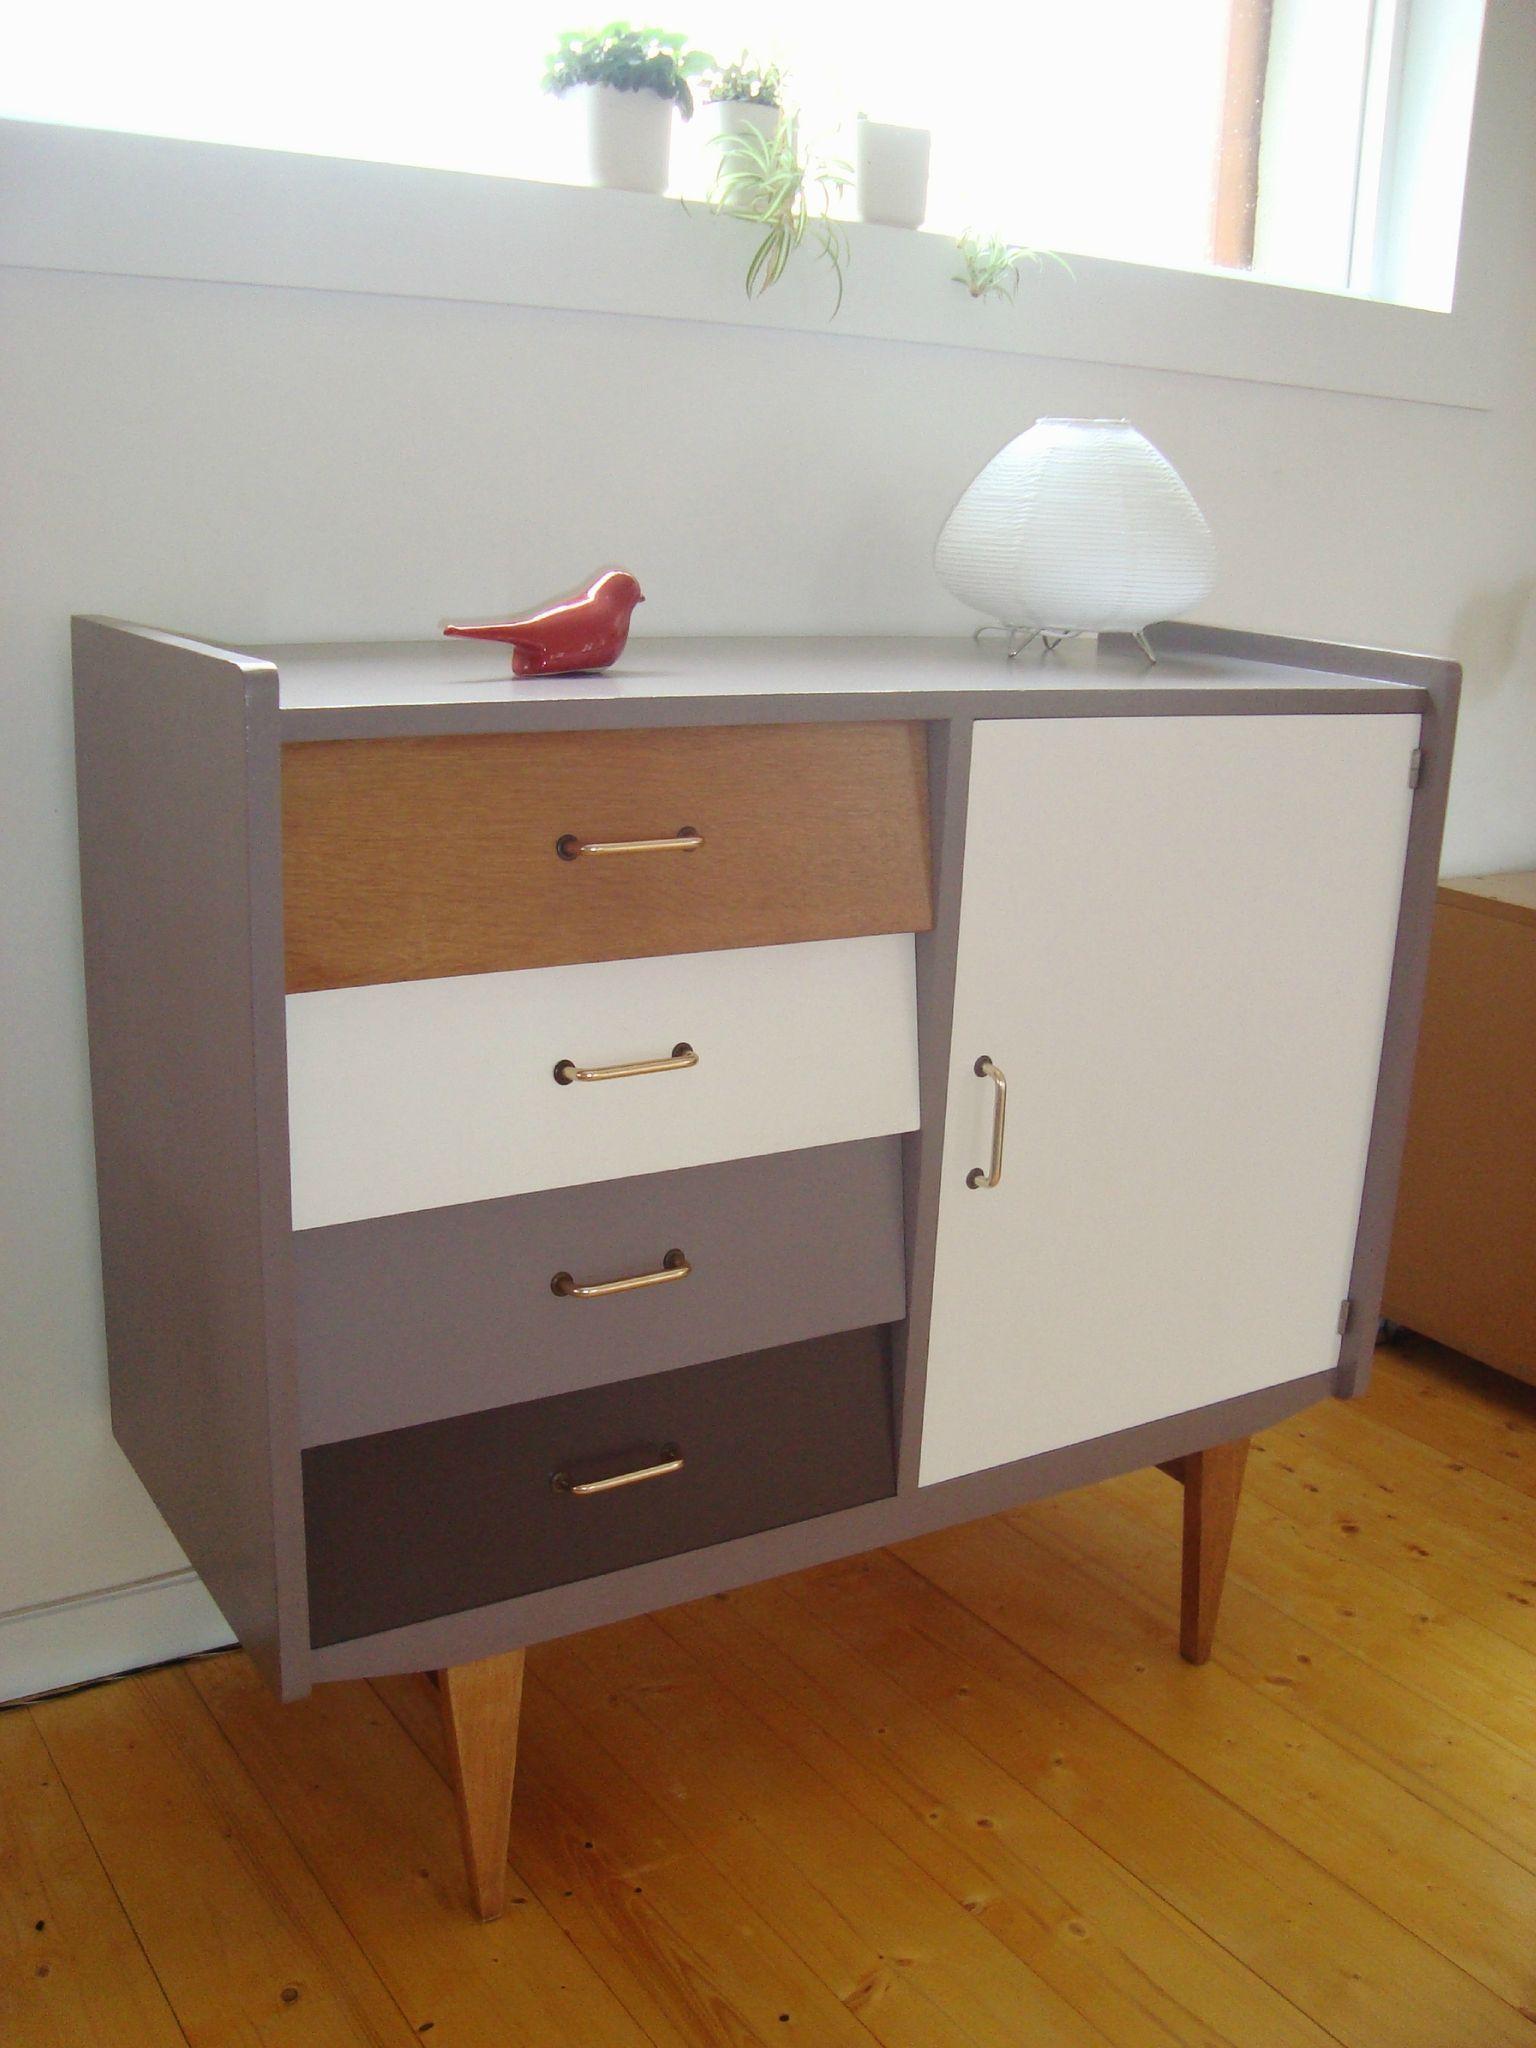 Pin von Orsolya Ping auf Livingroom   Pinterest   Komode, vintage ...